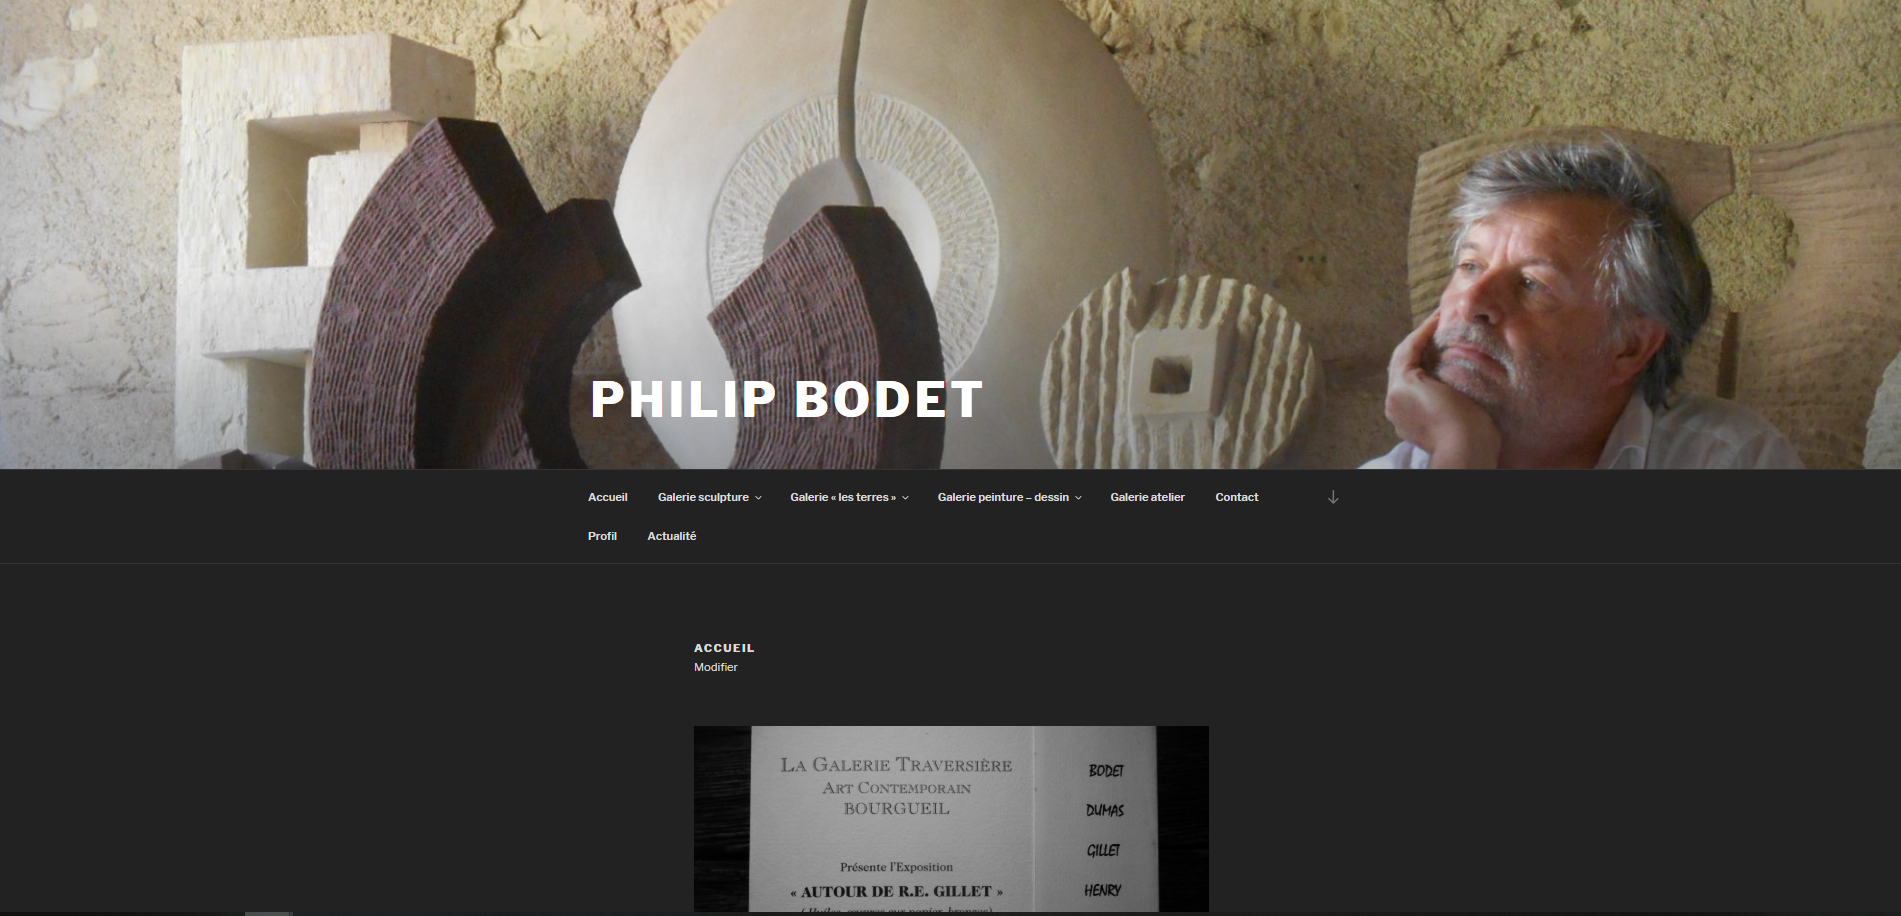 Philip Bodet